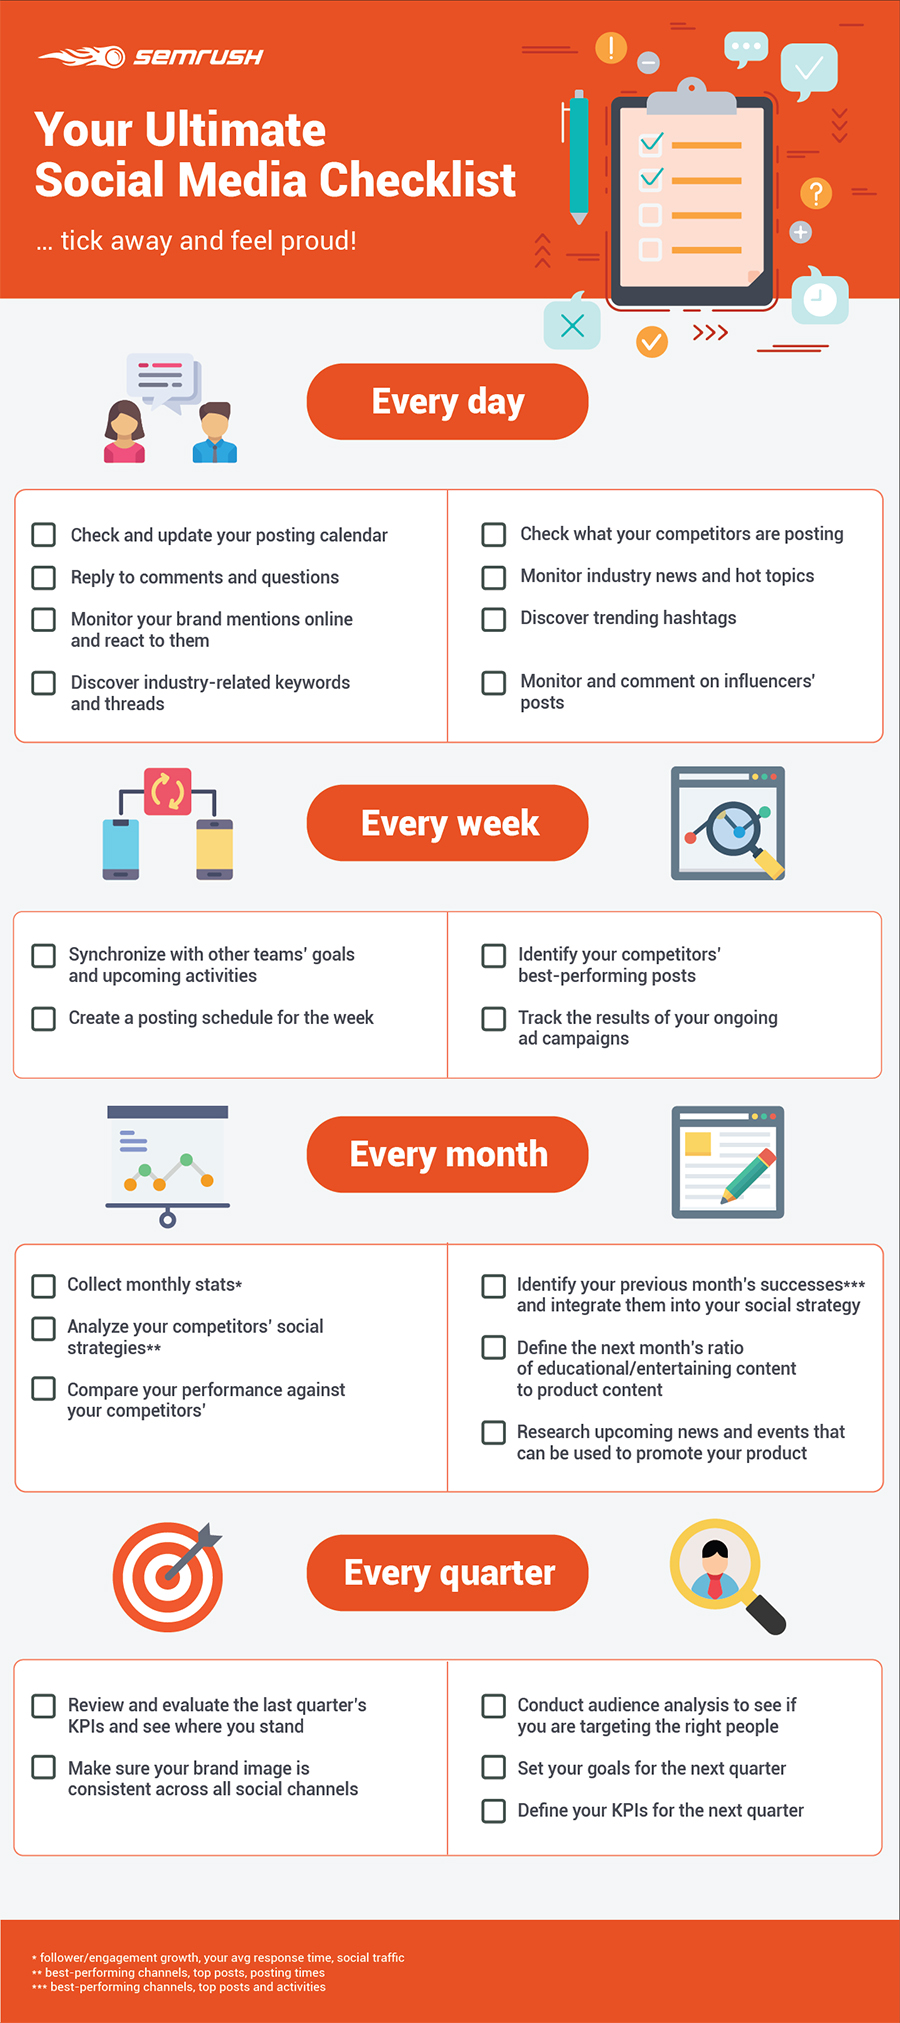 23 Step Checklist For Social Media Management Success